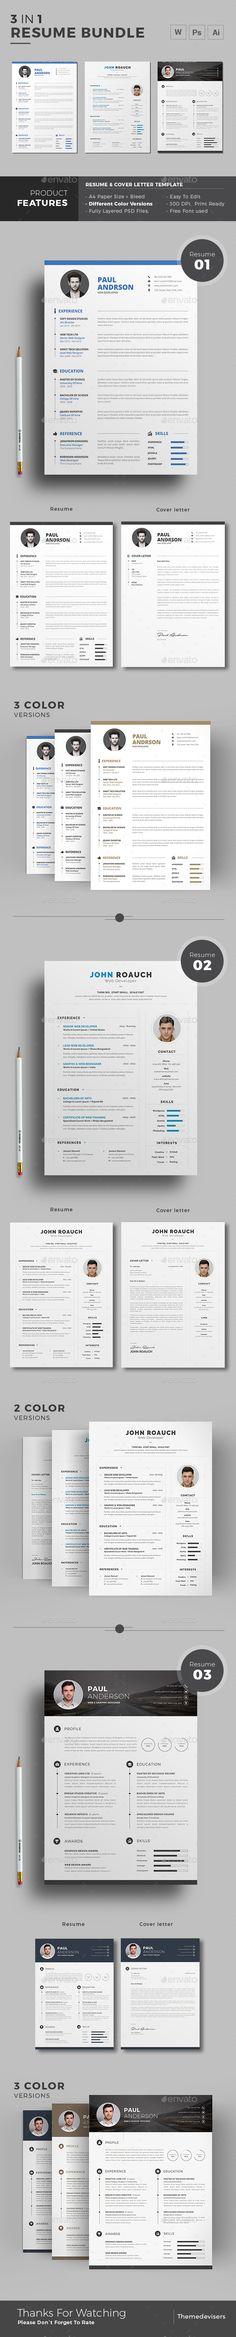 Resume Template PSD, AI Illustrator, MS Word. Download here: https://graphicriver.net/item/resume/17485881?ref=ksioks